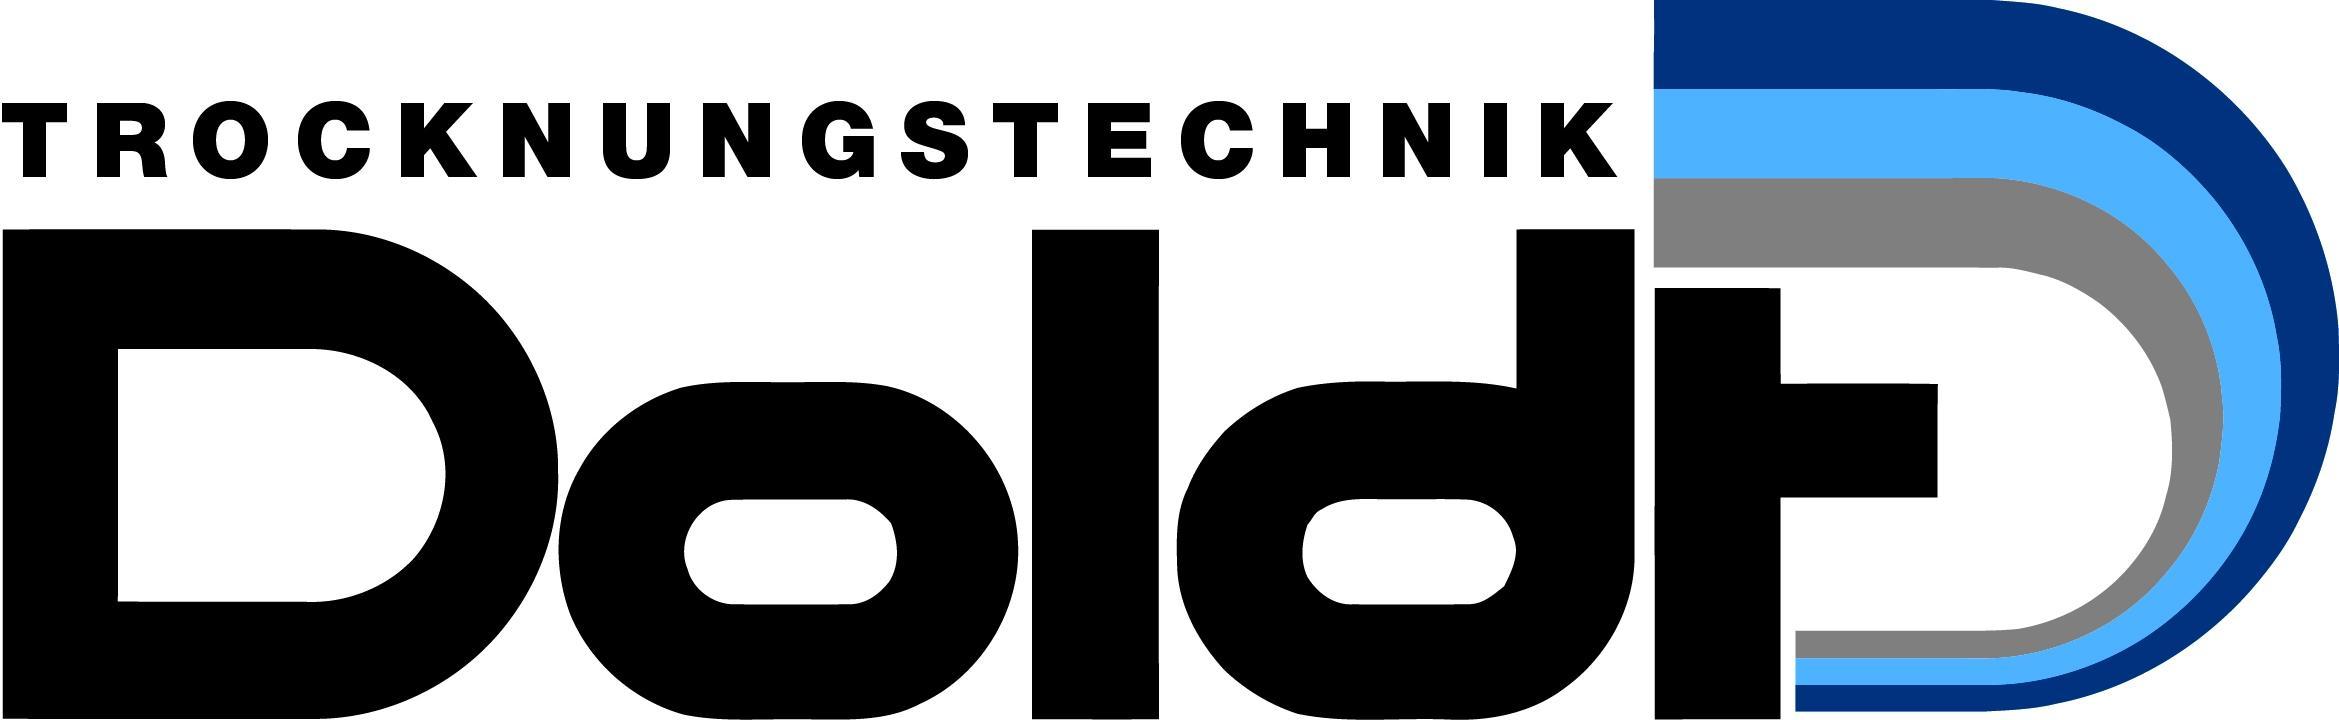 Trocknungstechnik Doldt GmbH